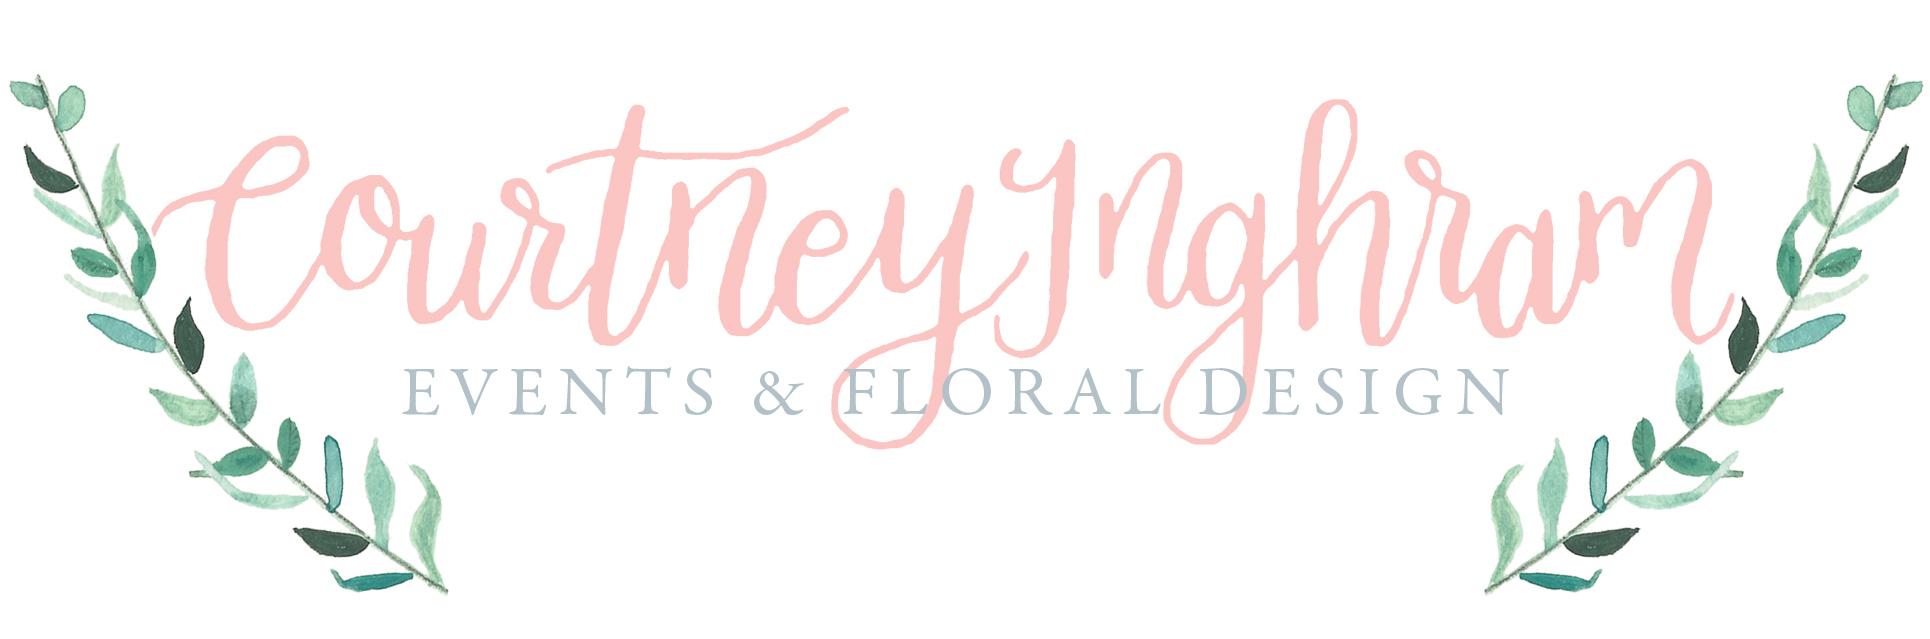 Custom Floral Designs + Event Planning